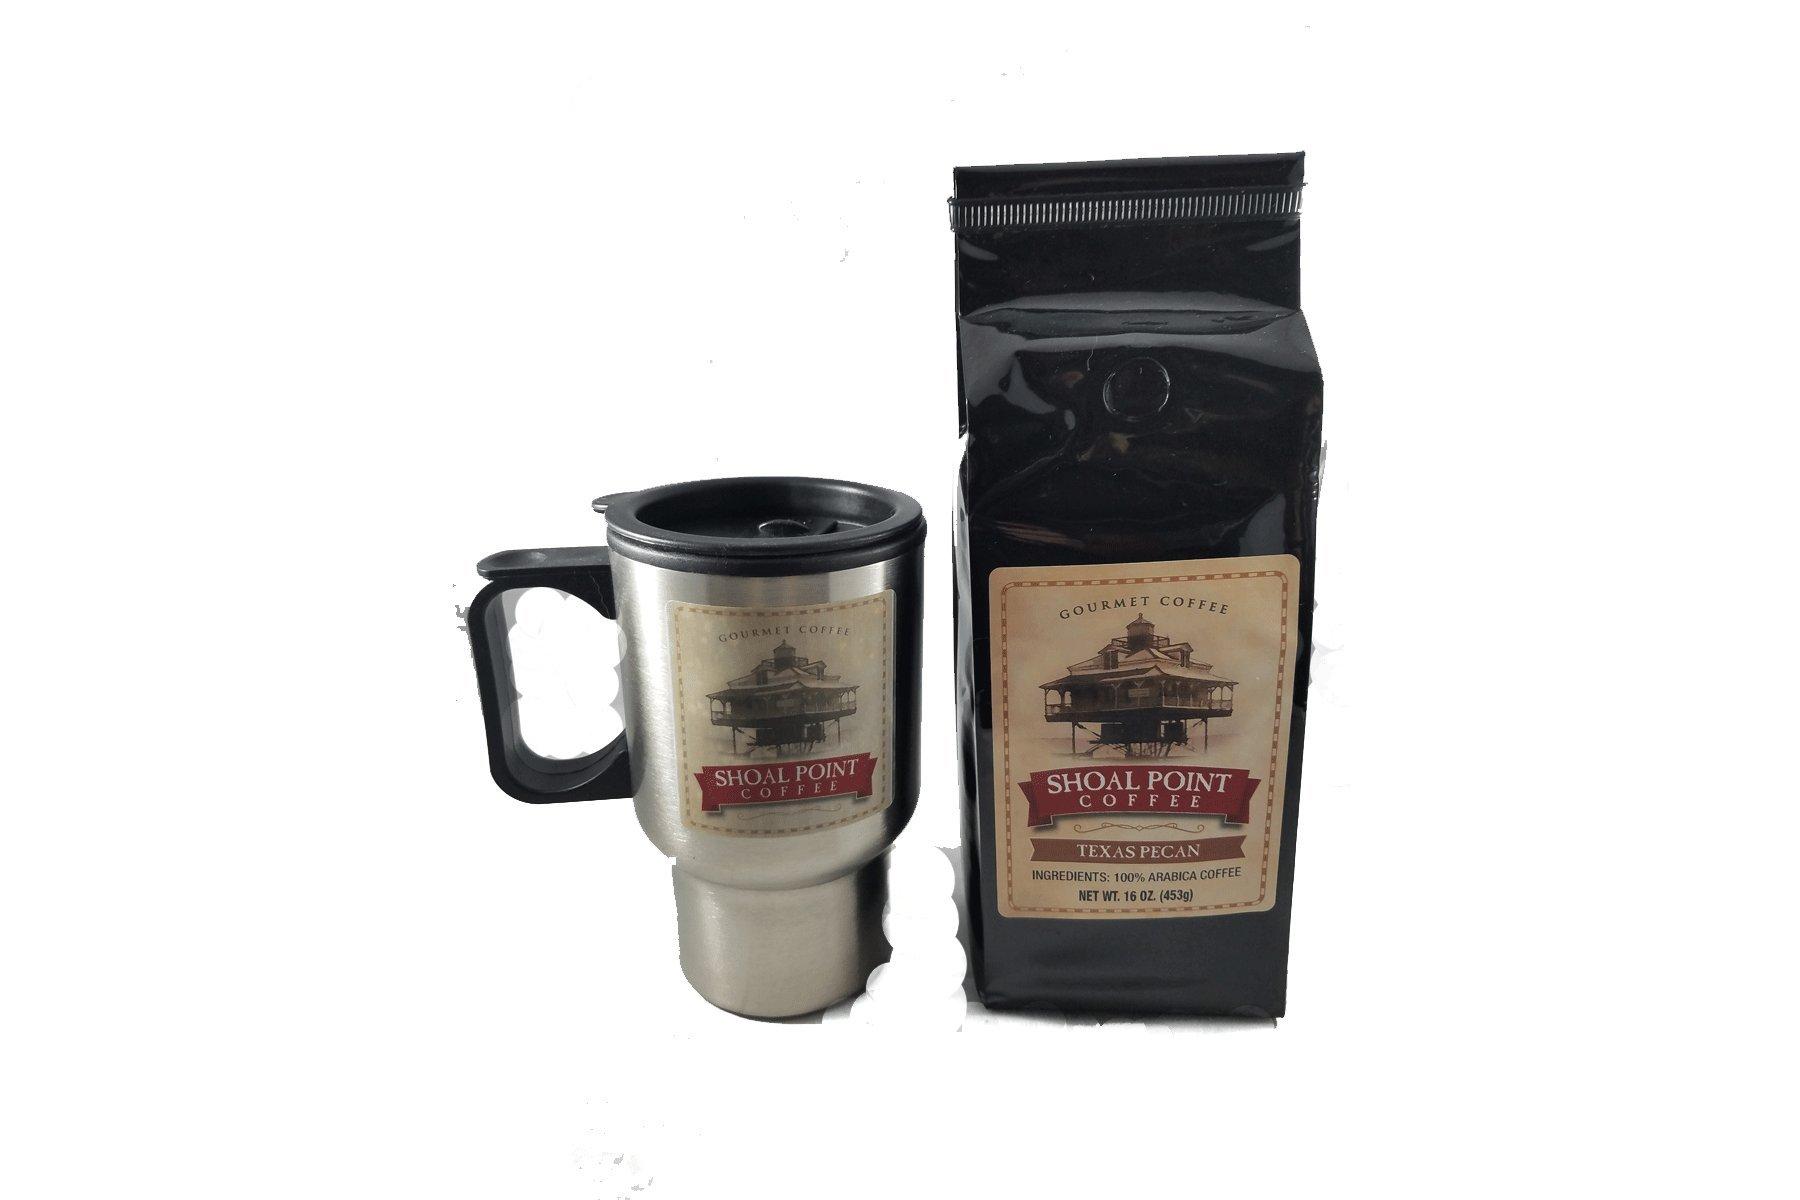 Shoal Point Gourmet Ground Coffee and Travel Mug (Texas Pecan)